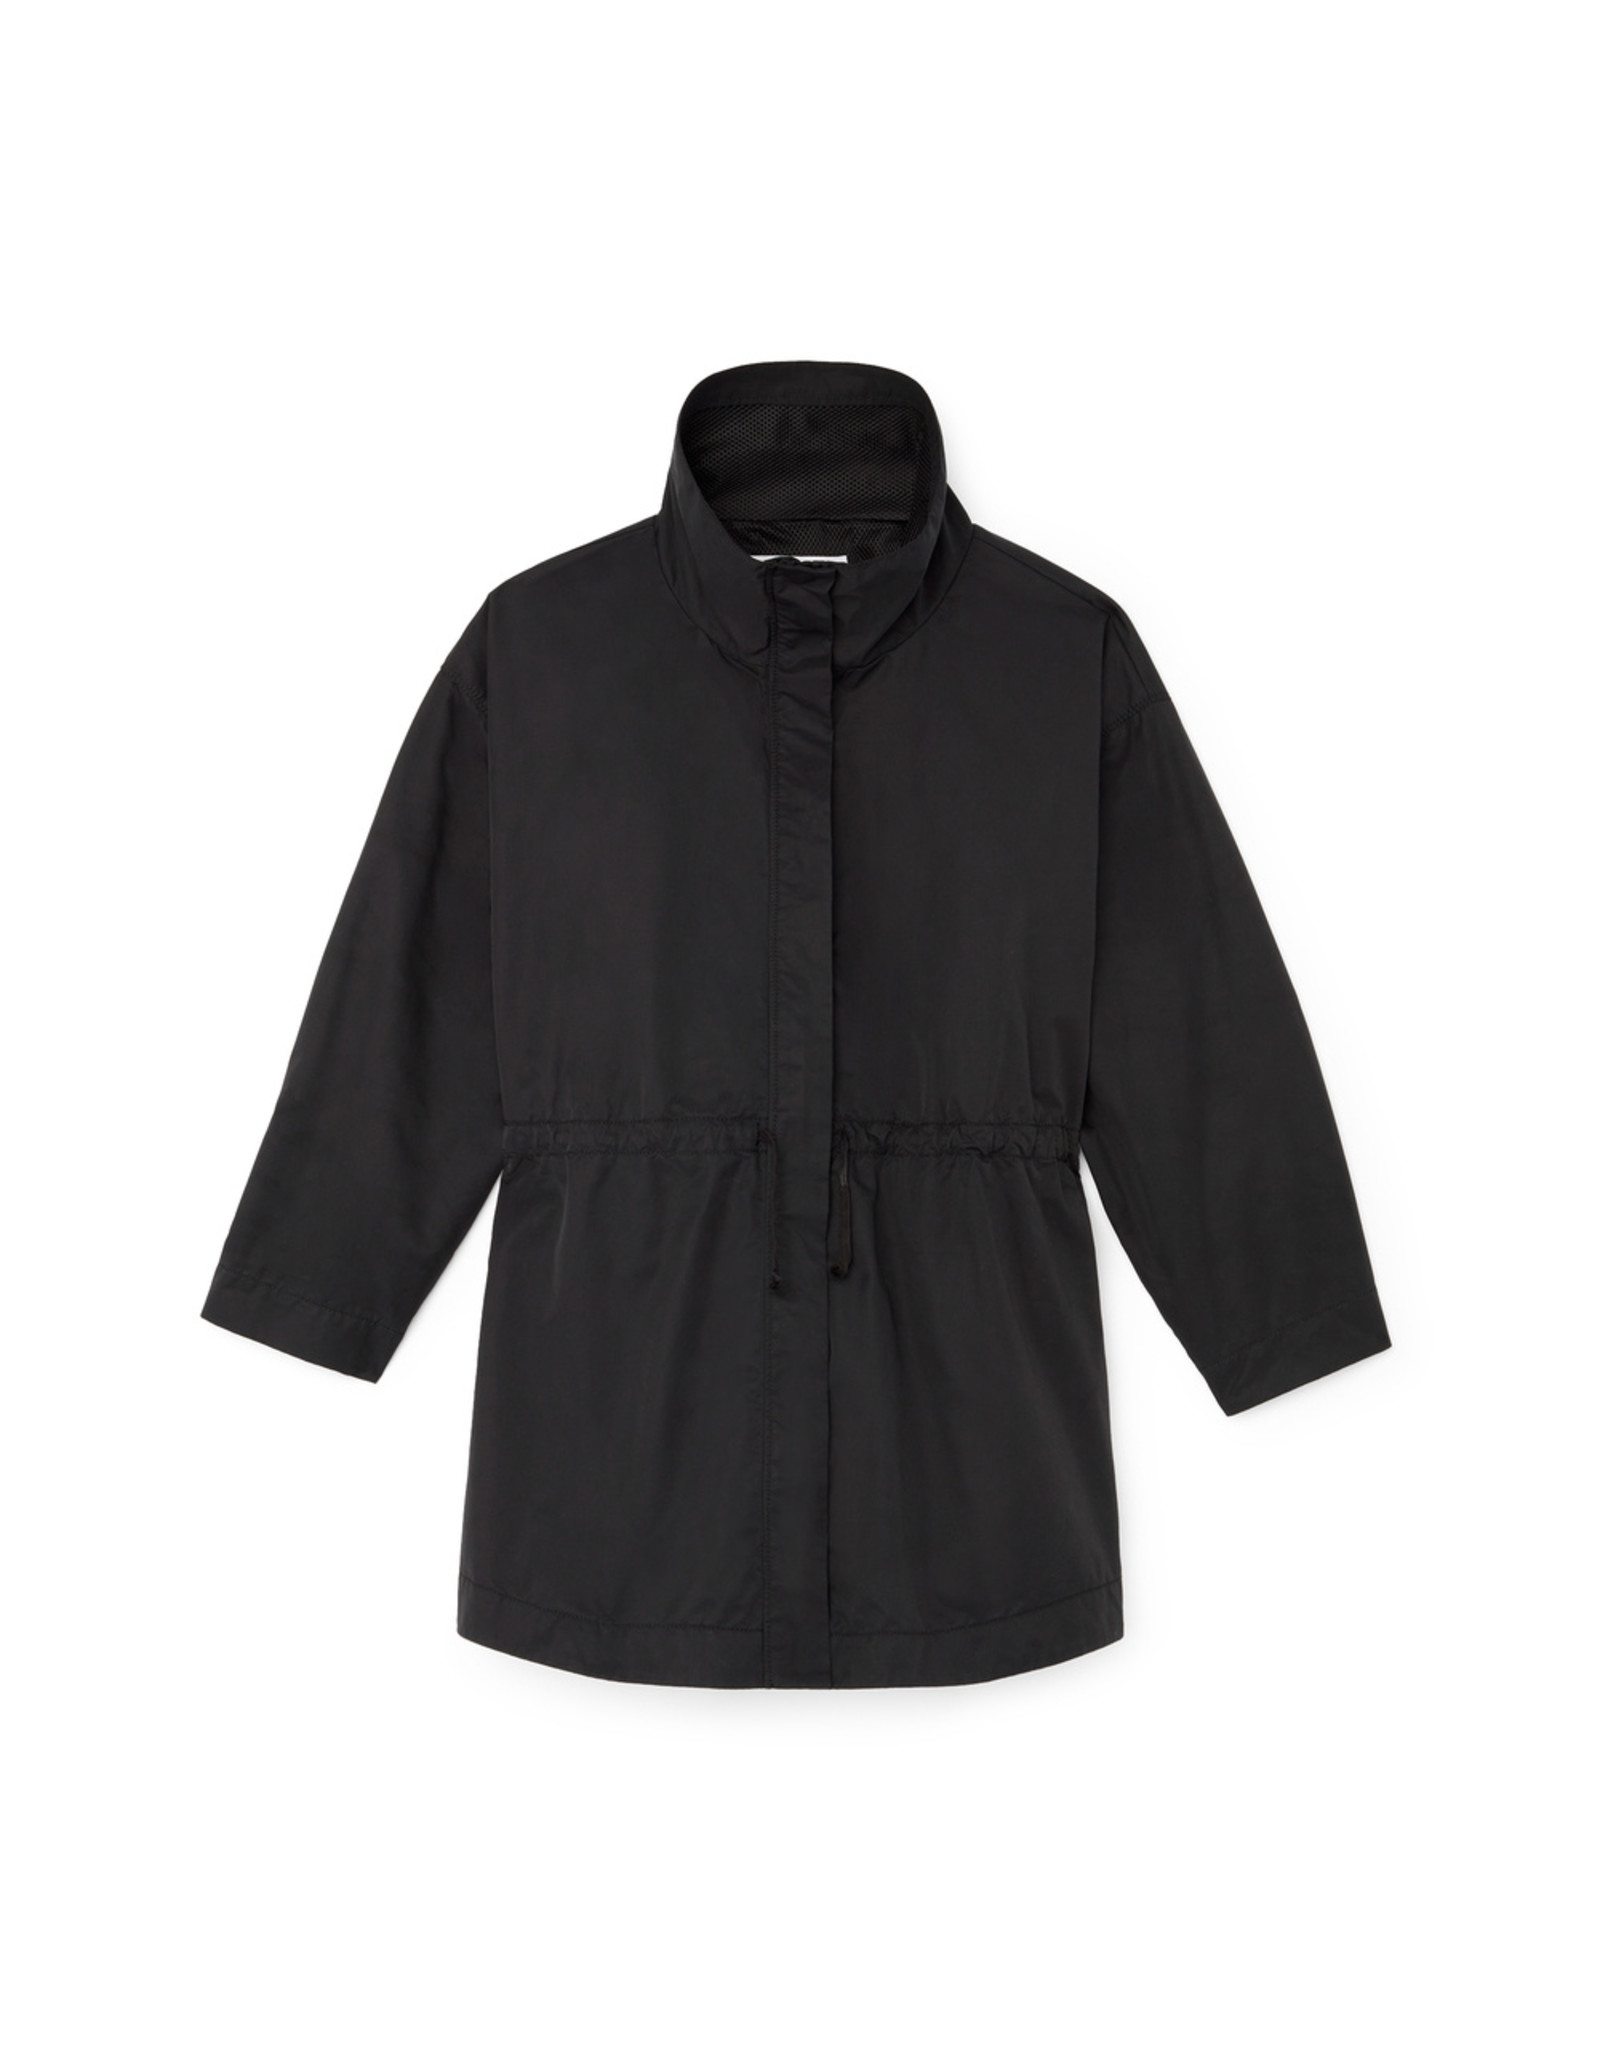 G. Sport x Proenza Schouler G. Sport x Proenza Schouler Jacket (Color: Black, Size: XS)